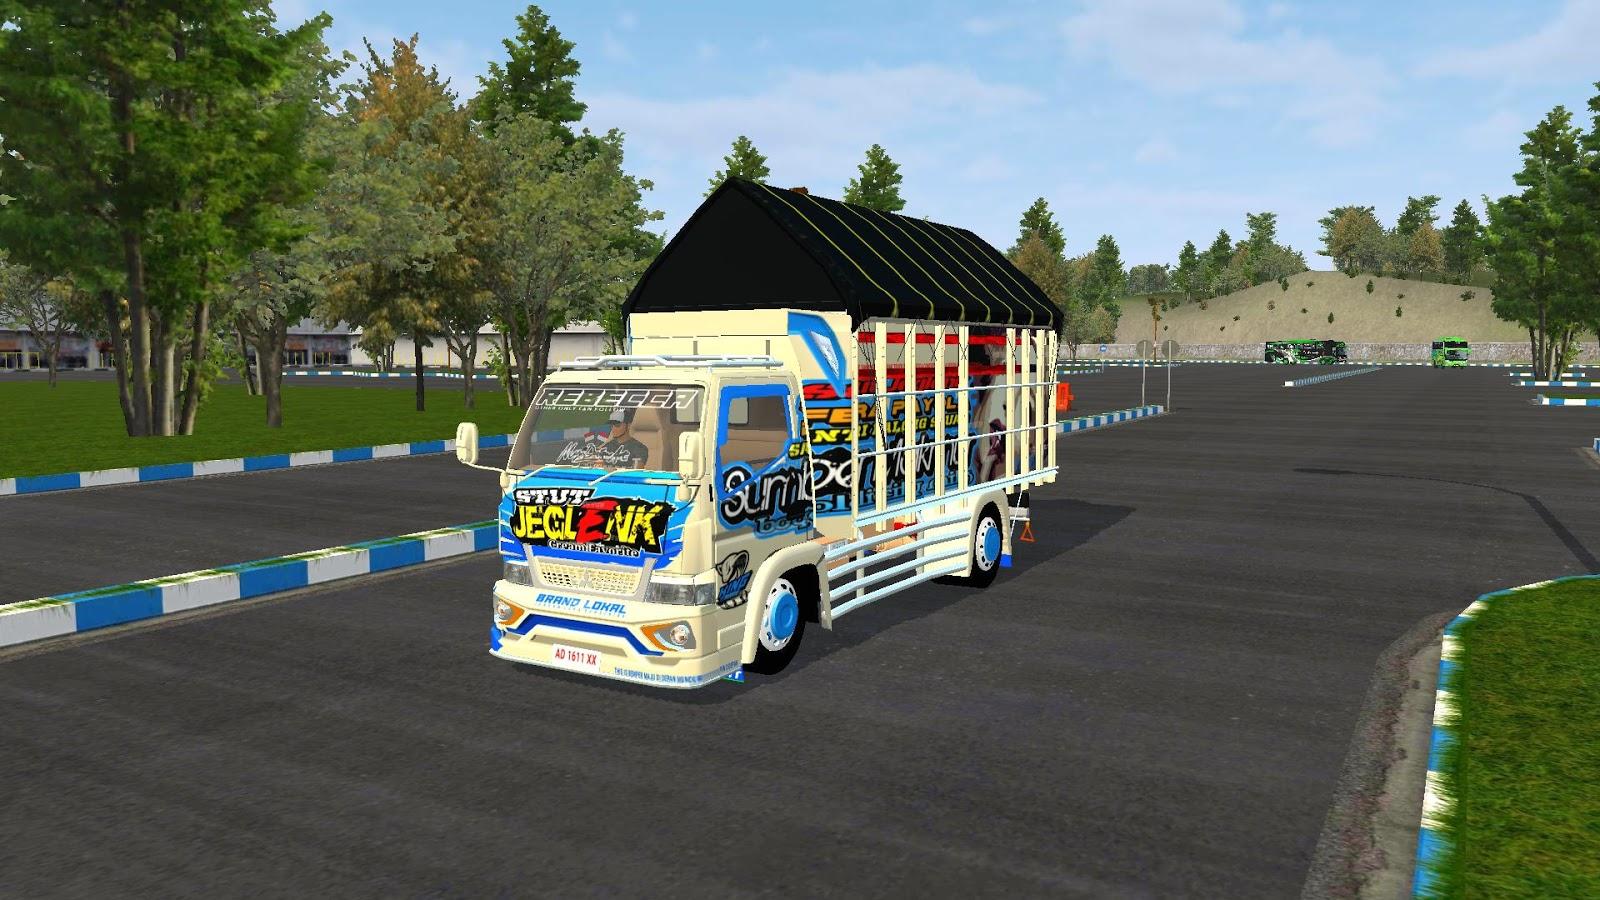 Livery Mod Truck Canter Stut Jeglenk